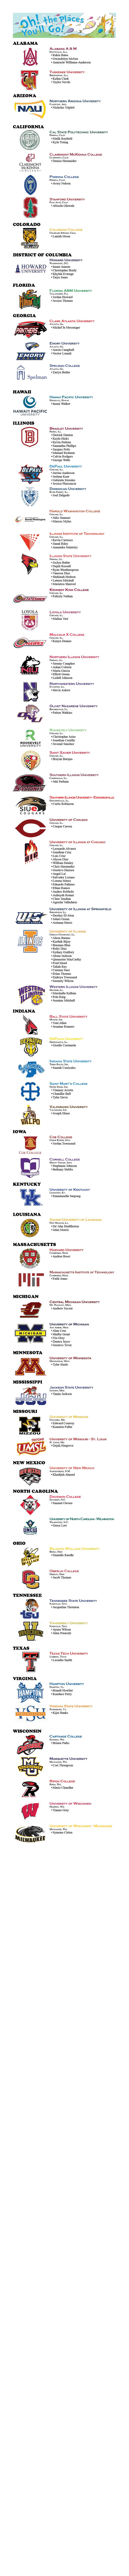 colleges2017